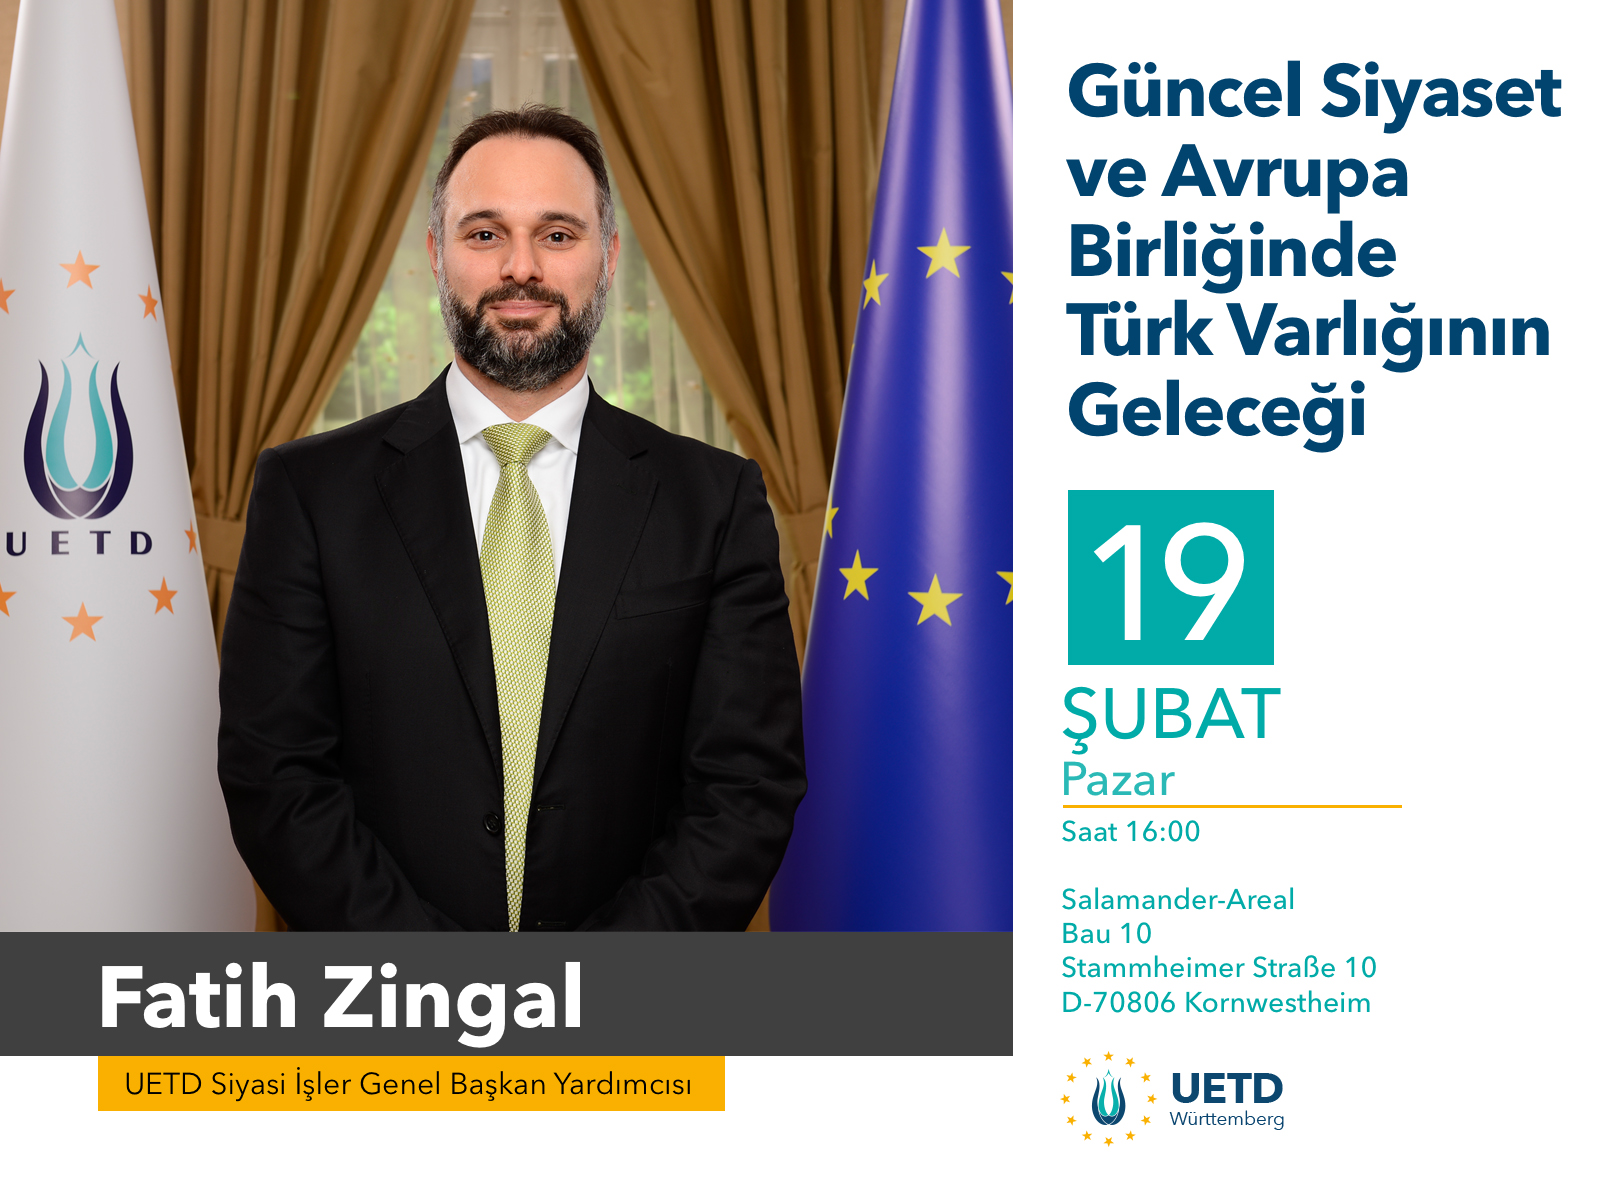 UETD_Konferanslar2017_Fatih-Zingal_Kornwestheim_170217 (1)